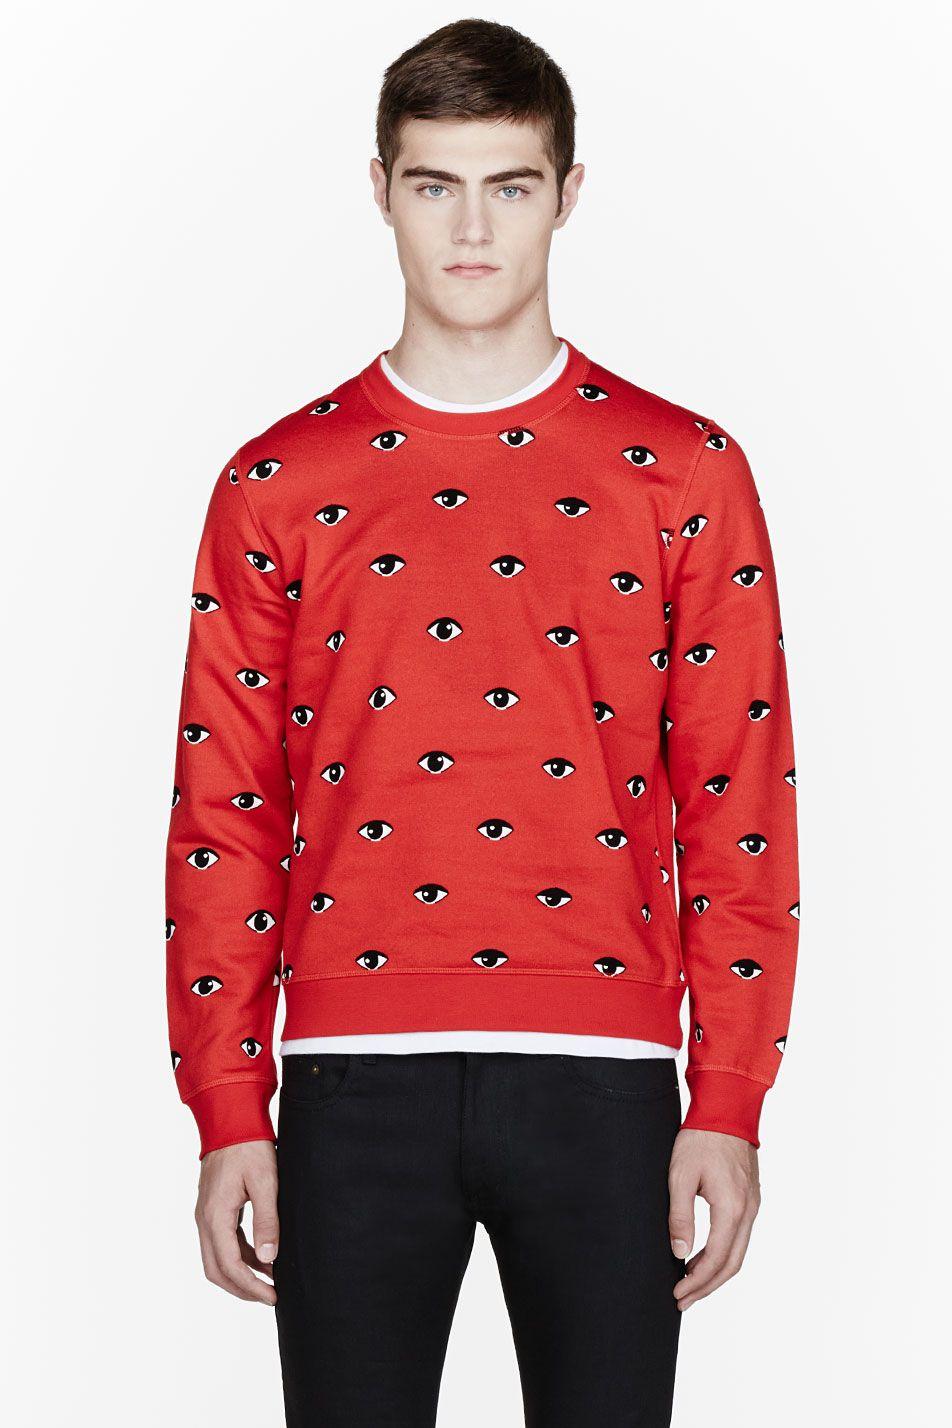 Cheap Kenzo Eye Sweatshirt Mens